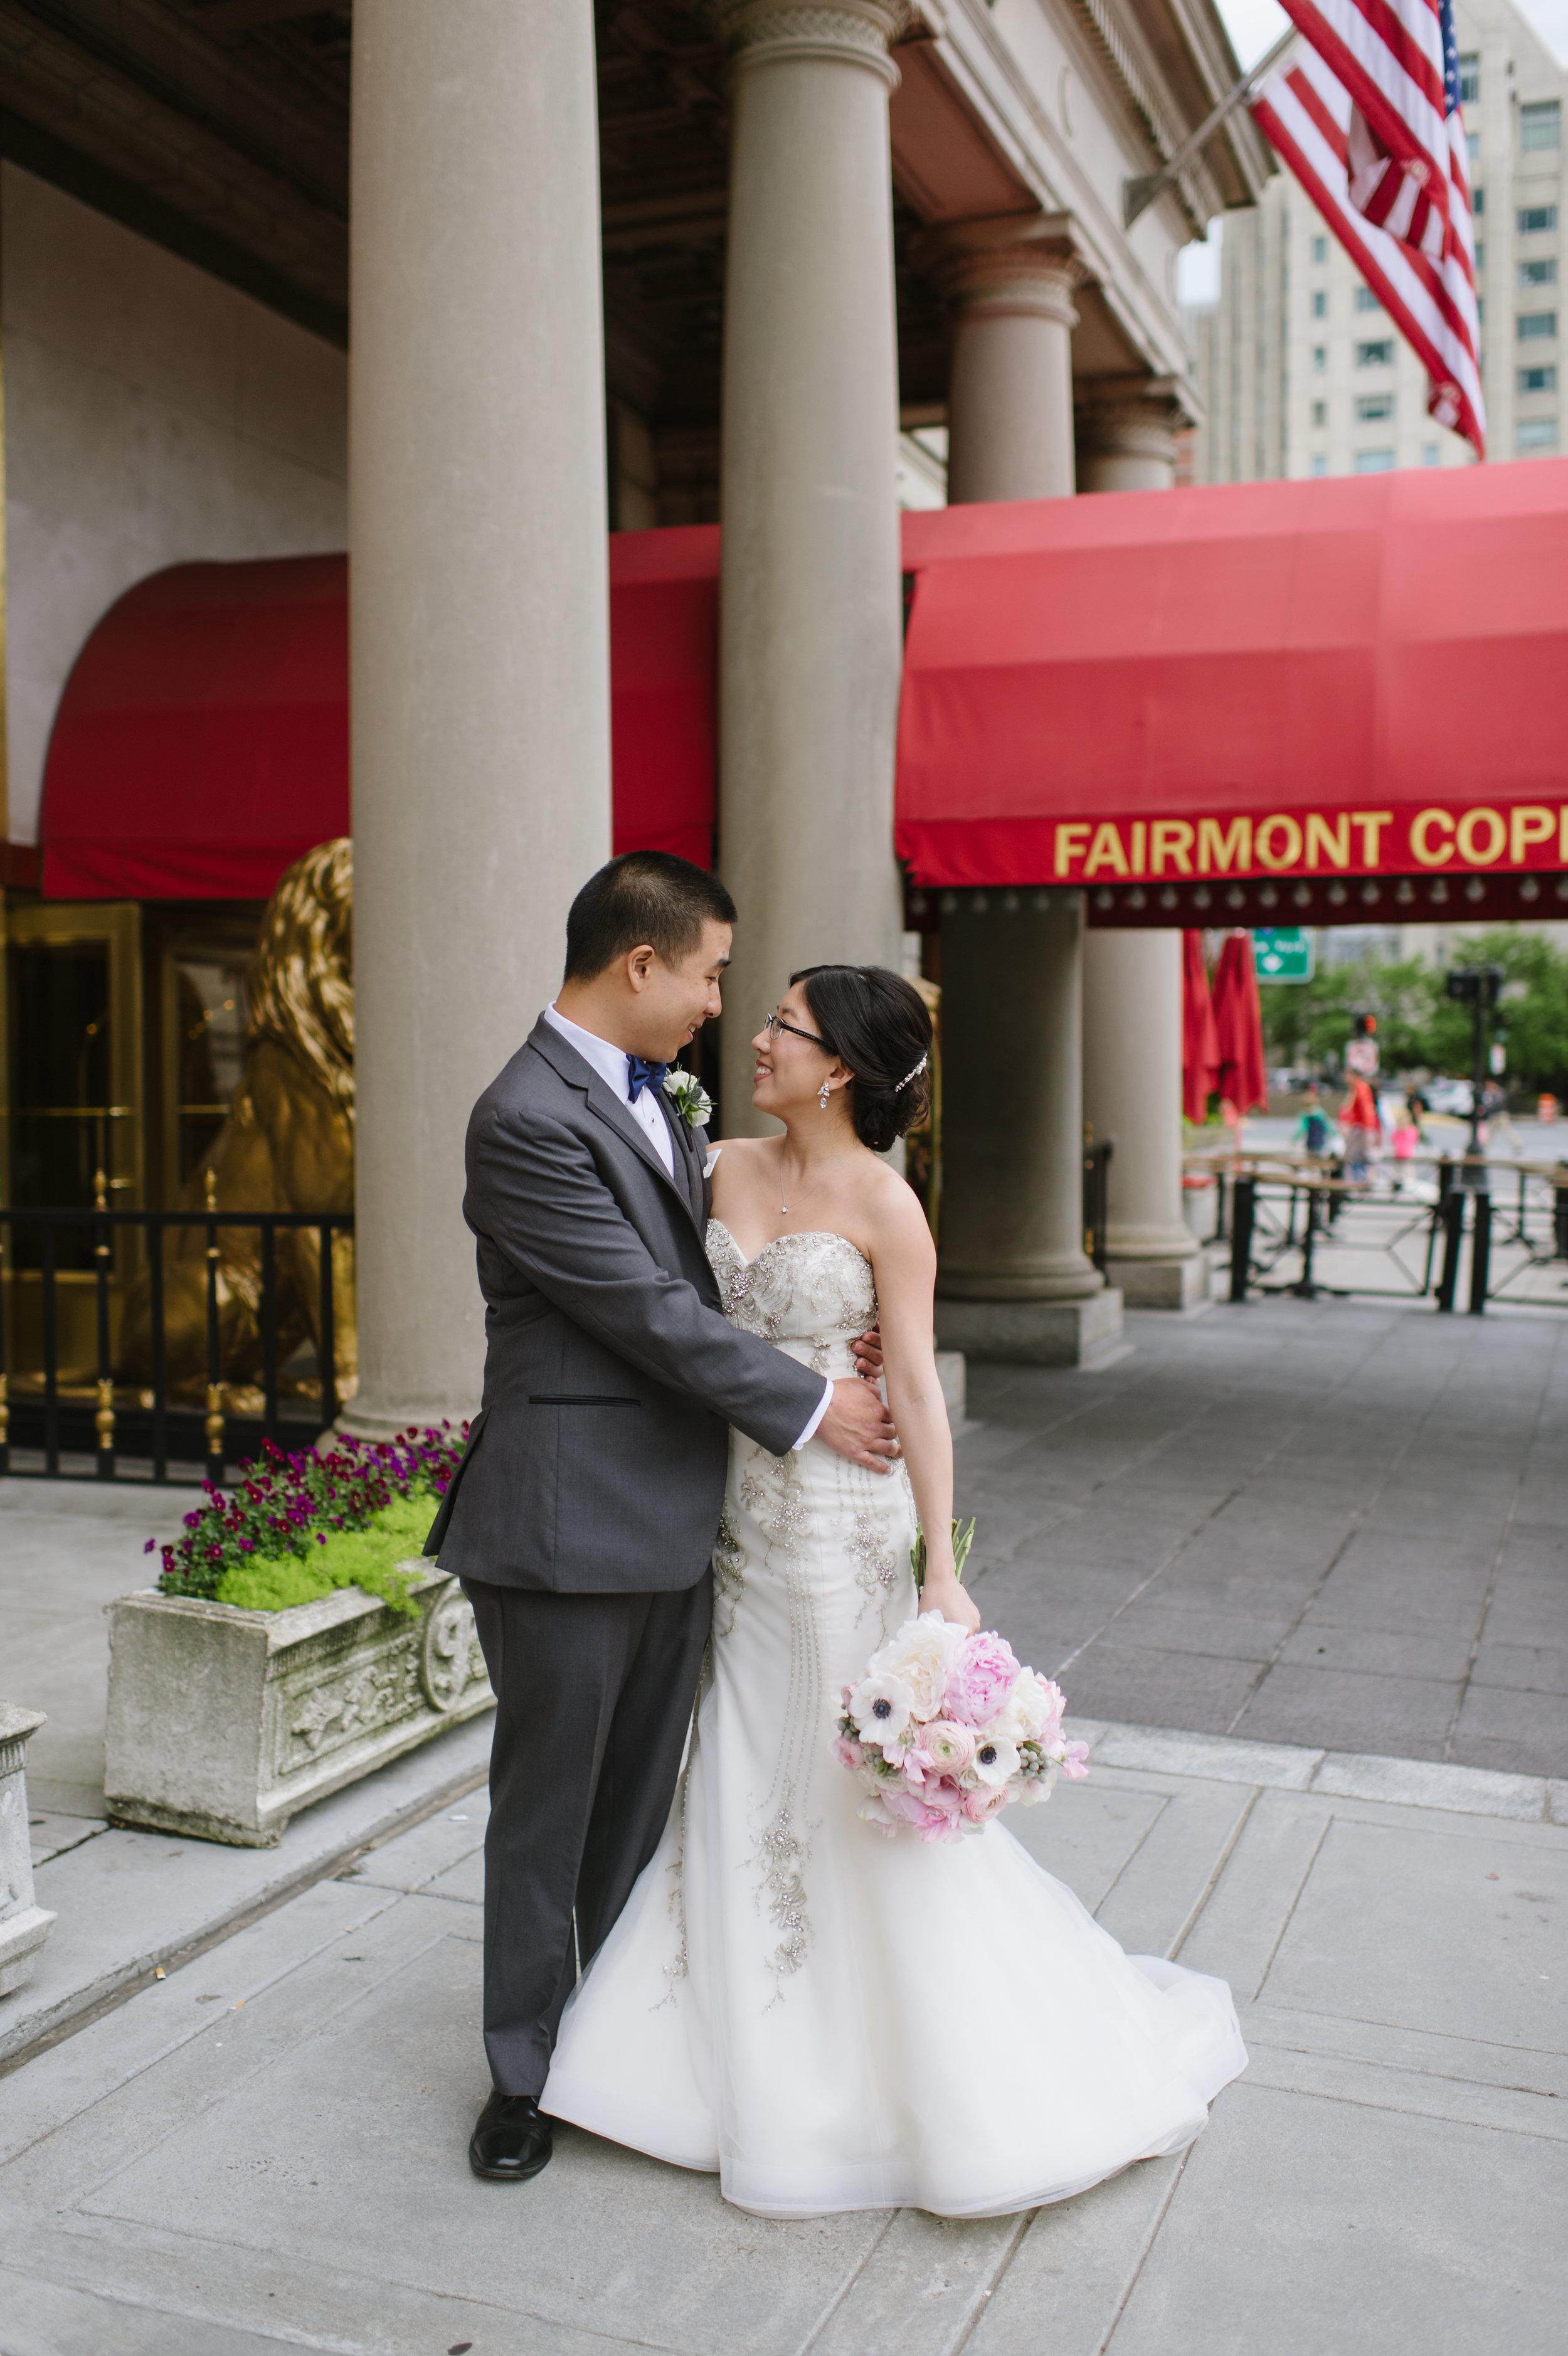 Fairmont-Copley-Wedding017.jpg